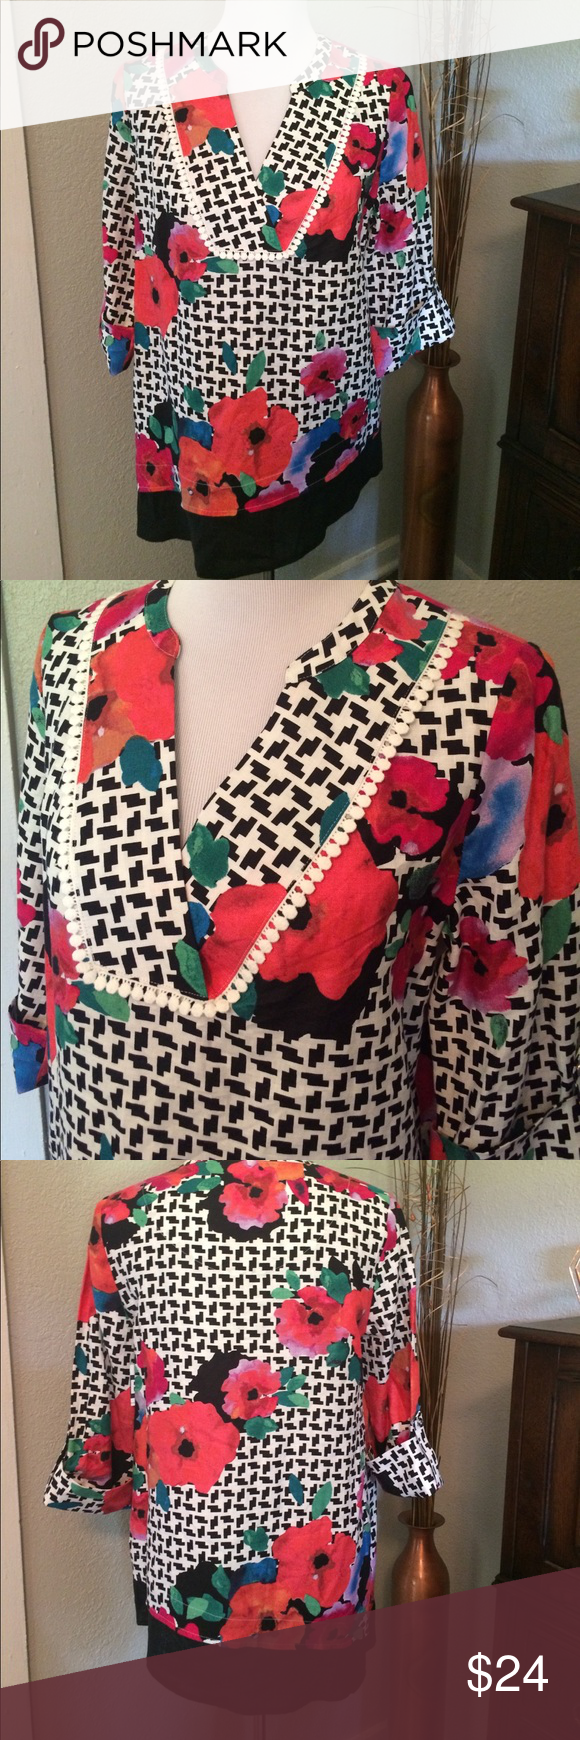 Asymmetrical Linen Poppy Tunic by Rafaella Never worn. 100% linen Rafaella Tops Tunics